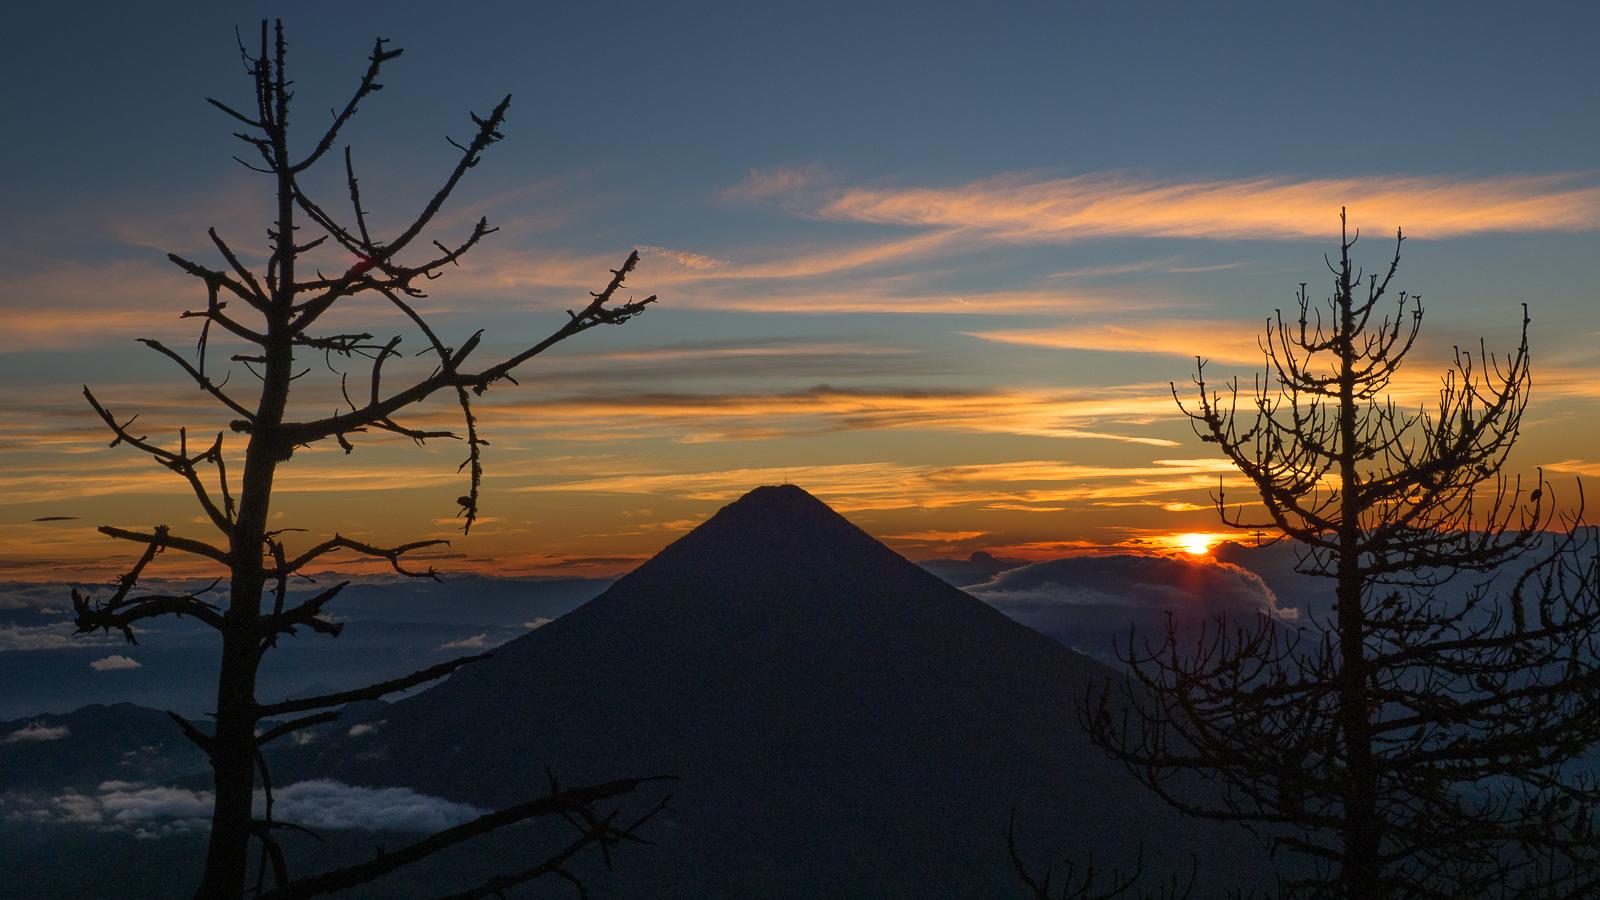 Volcán de agua, Guatemala